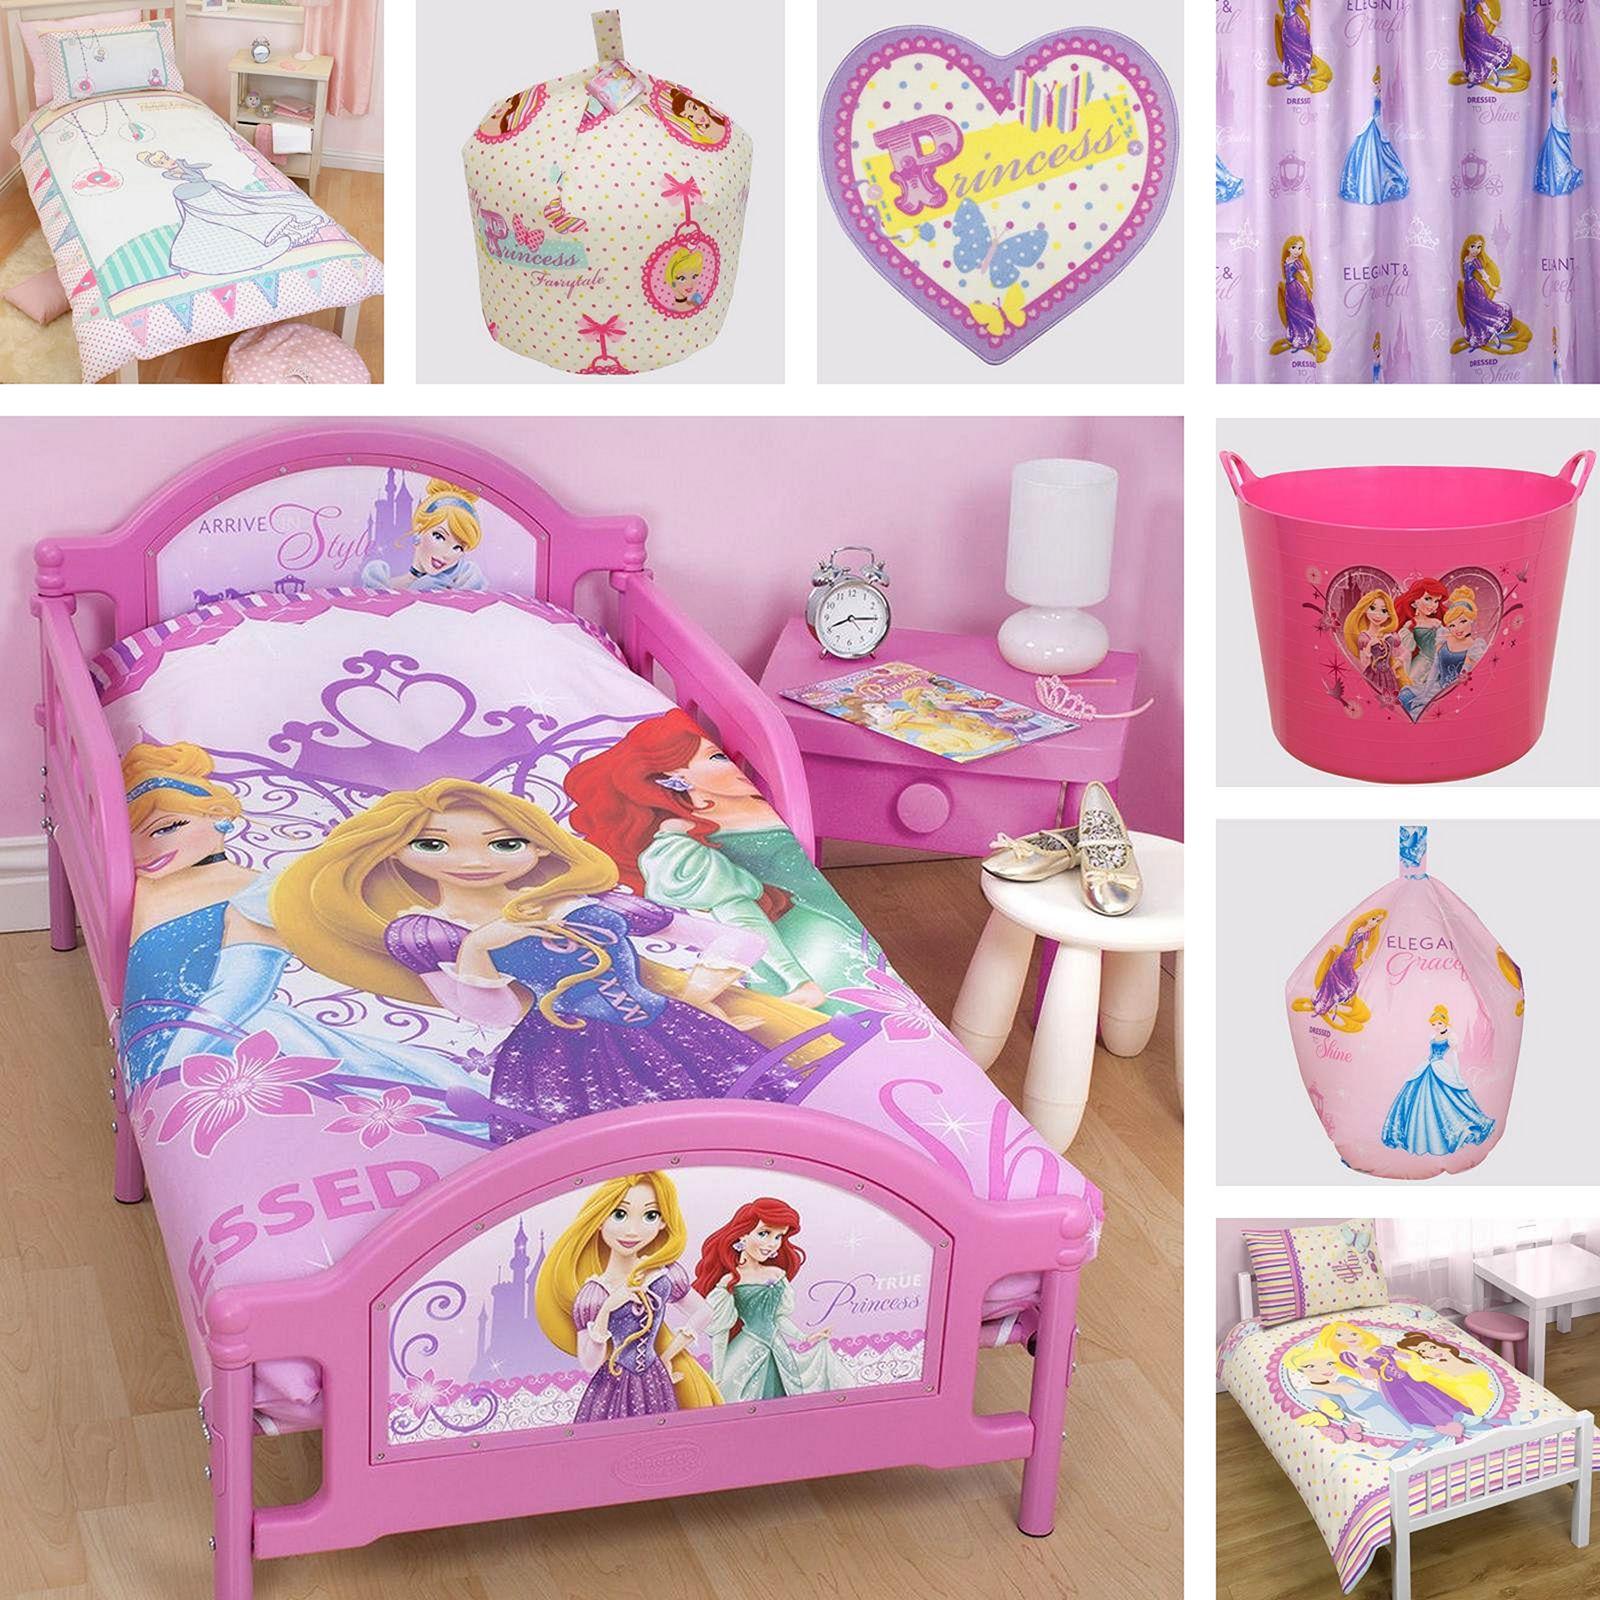 disney princess bedroom set  DECOREDO